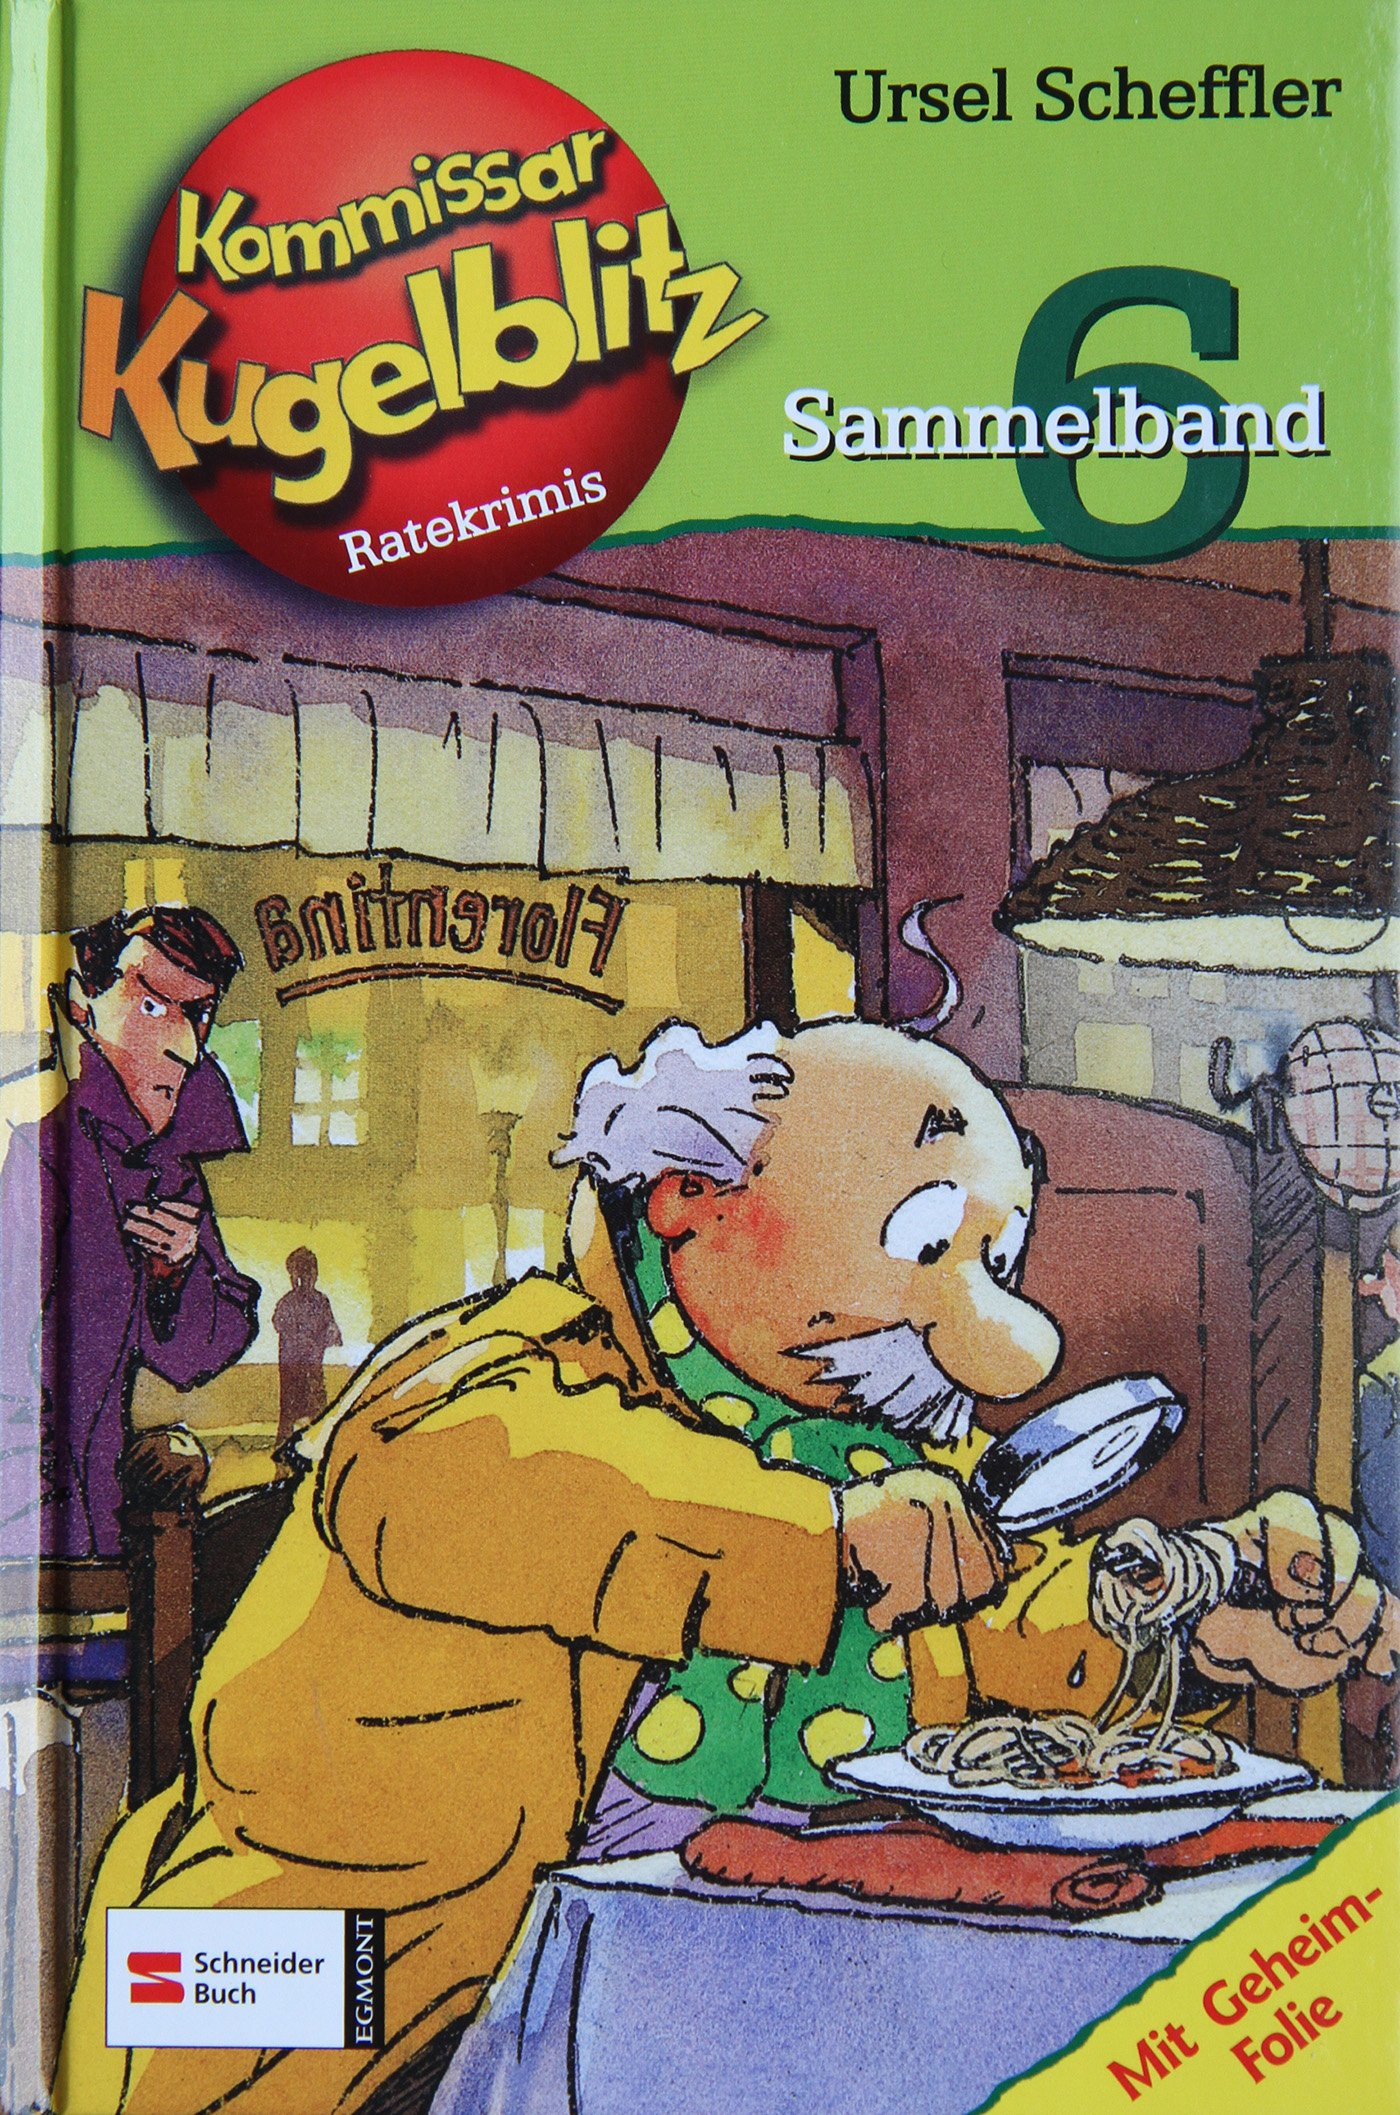 Kommissar Kugelblitz Sammelband 06 (Kommissar Kugelblitz Sammelbände, Band 6)